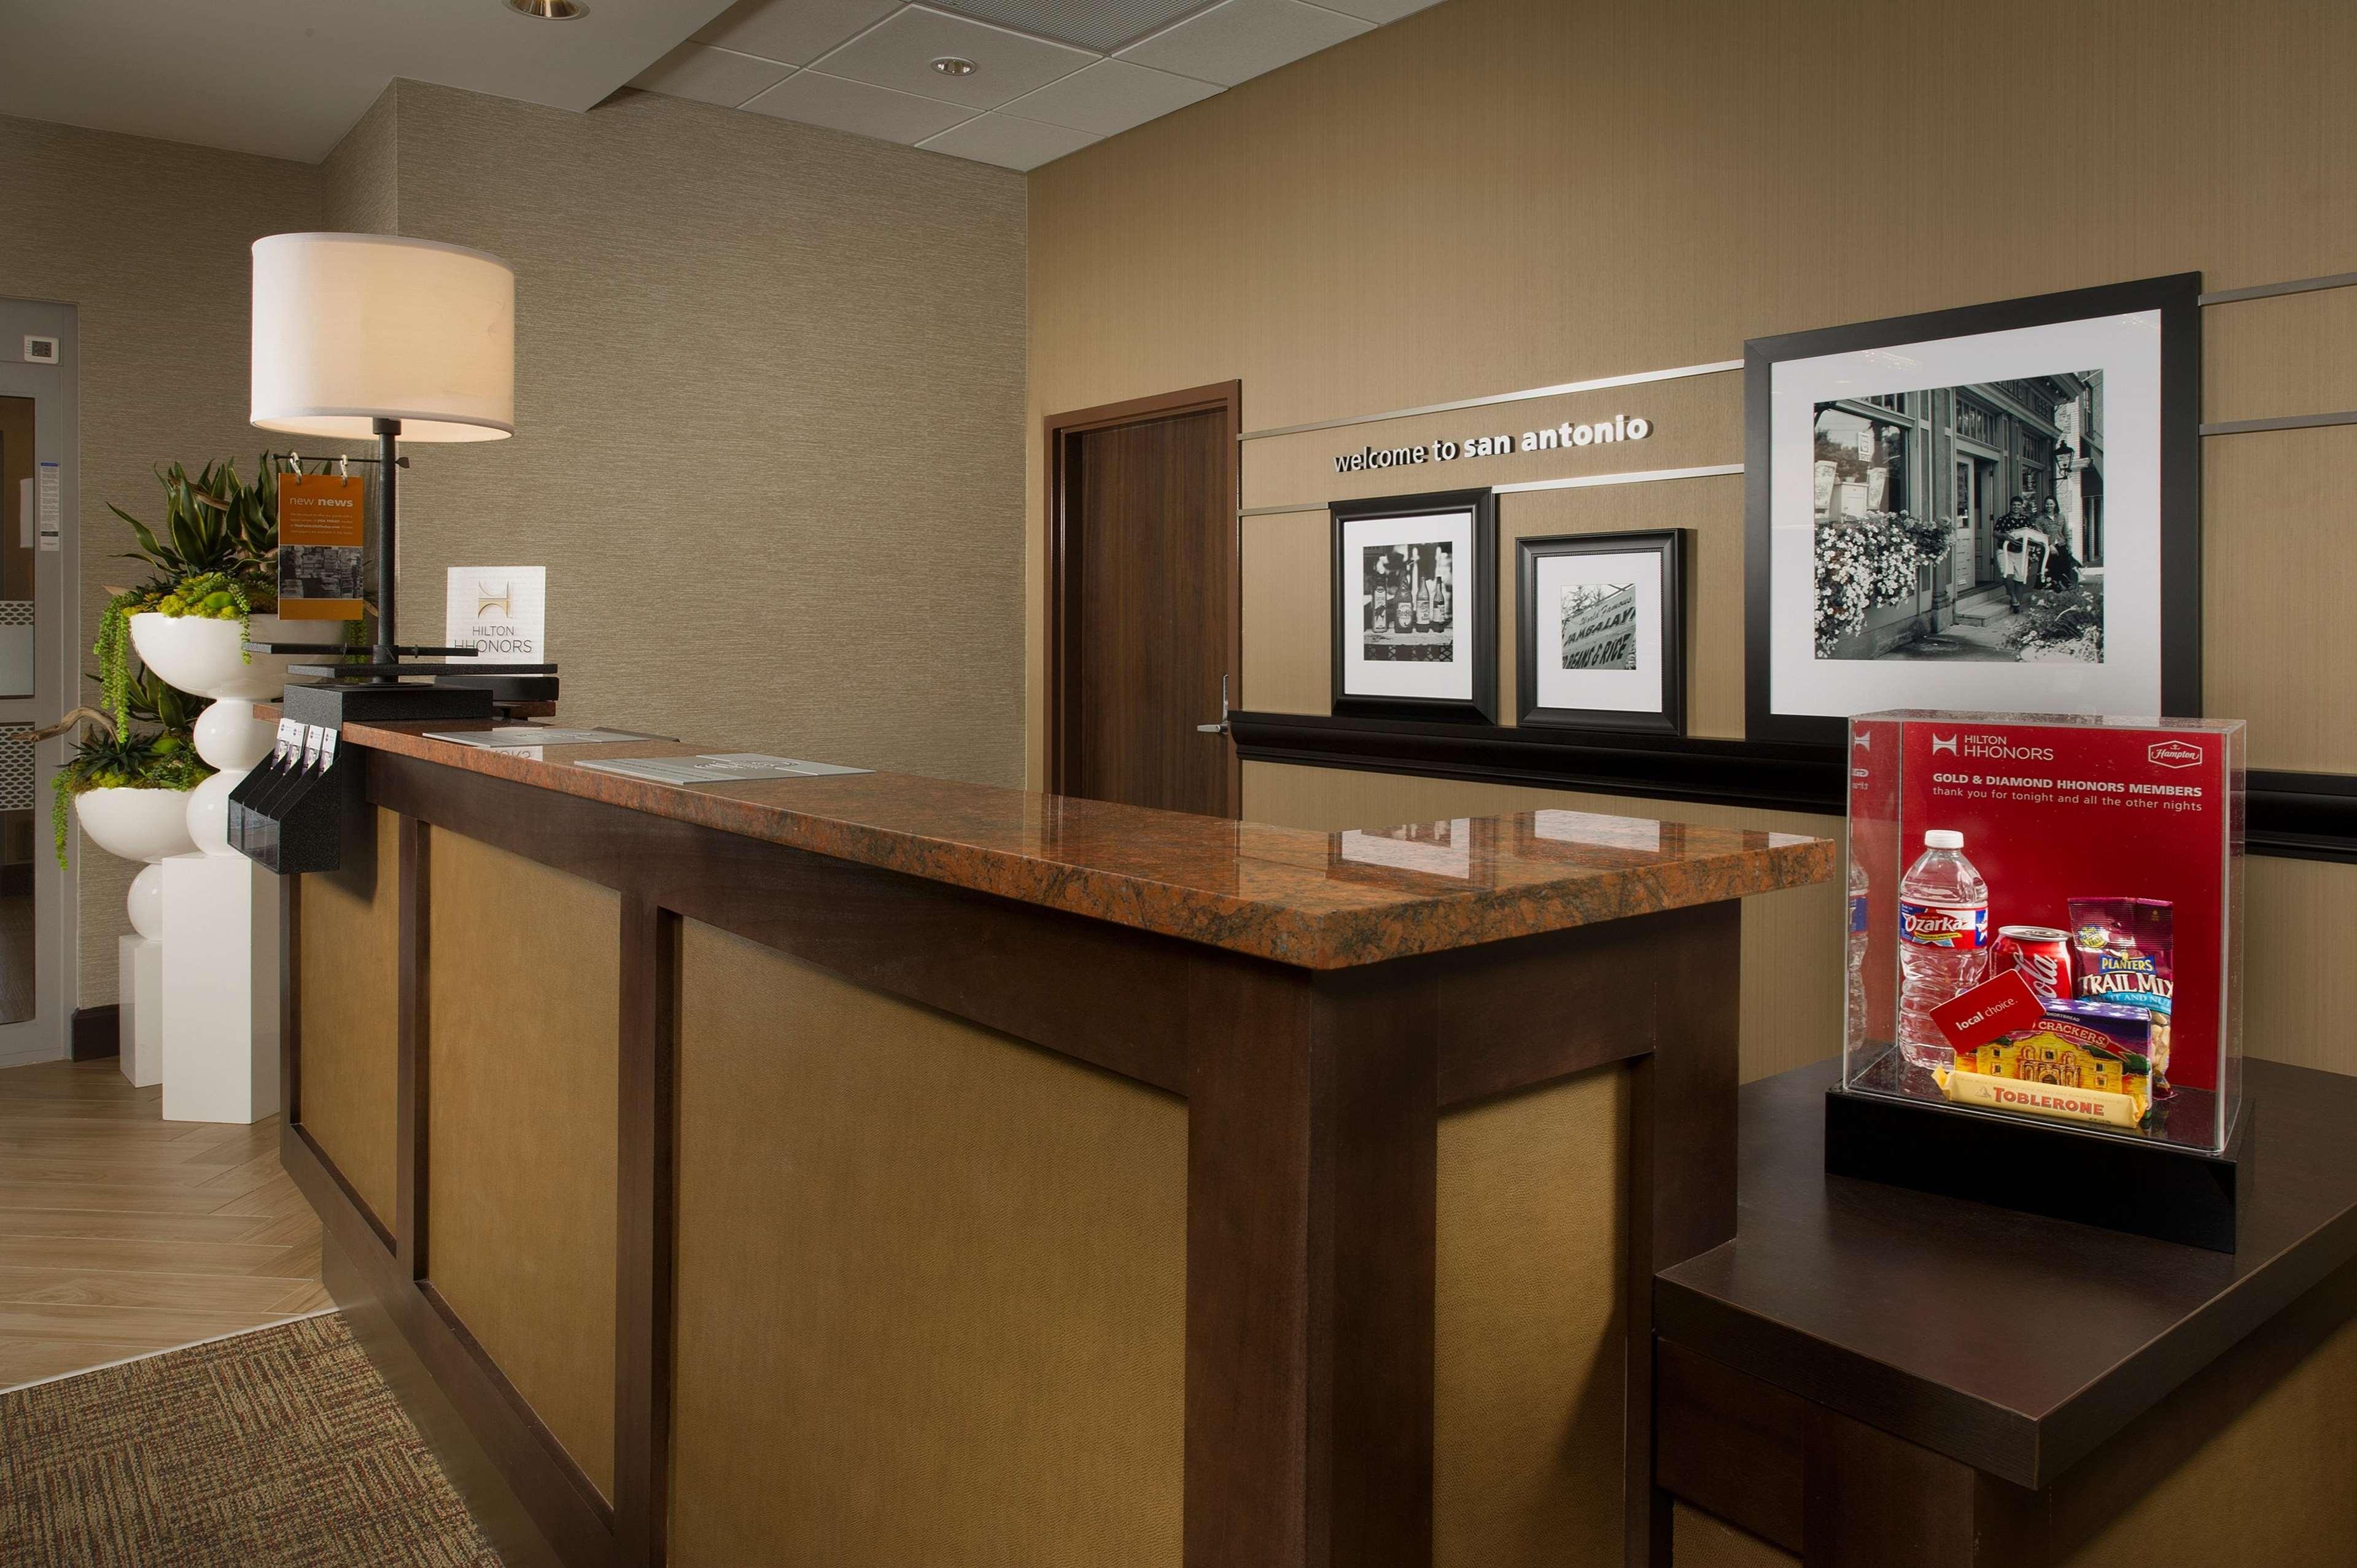 Hampton Inn & Suites San Antonio-Downtown/Market Square image 4